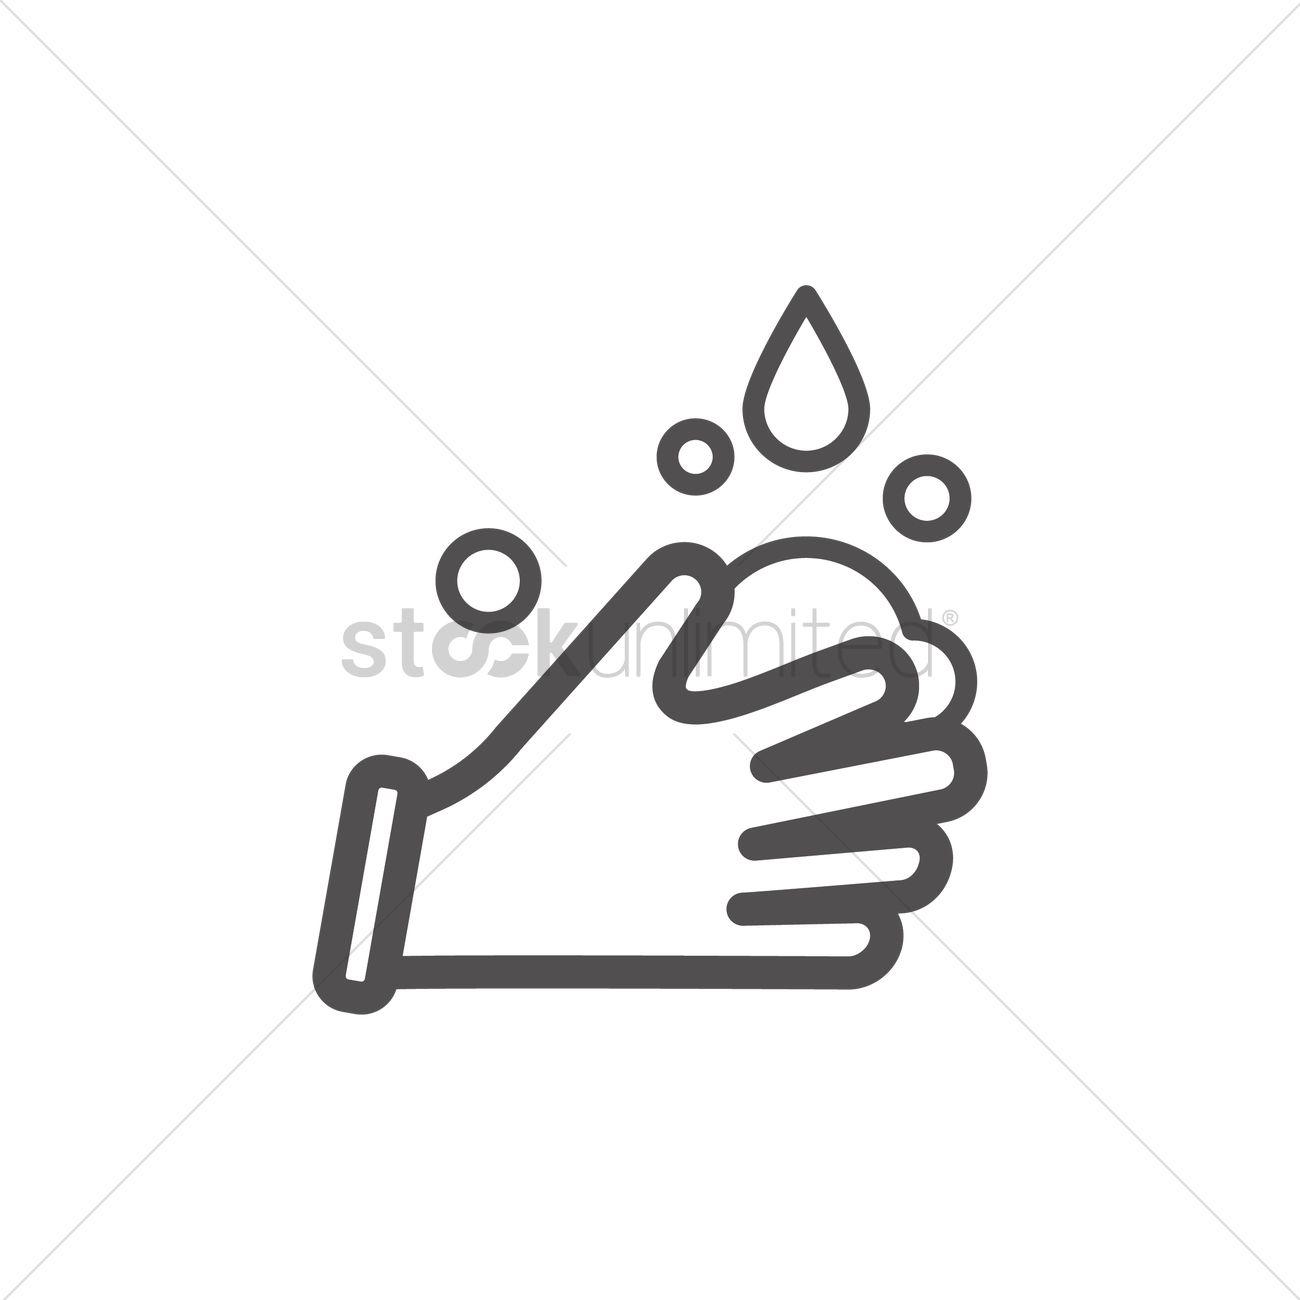 Hand wash icon vector image 1999093 stockunlimited hand wash icon vector graphic buycottarizona Image collections